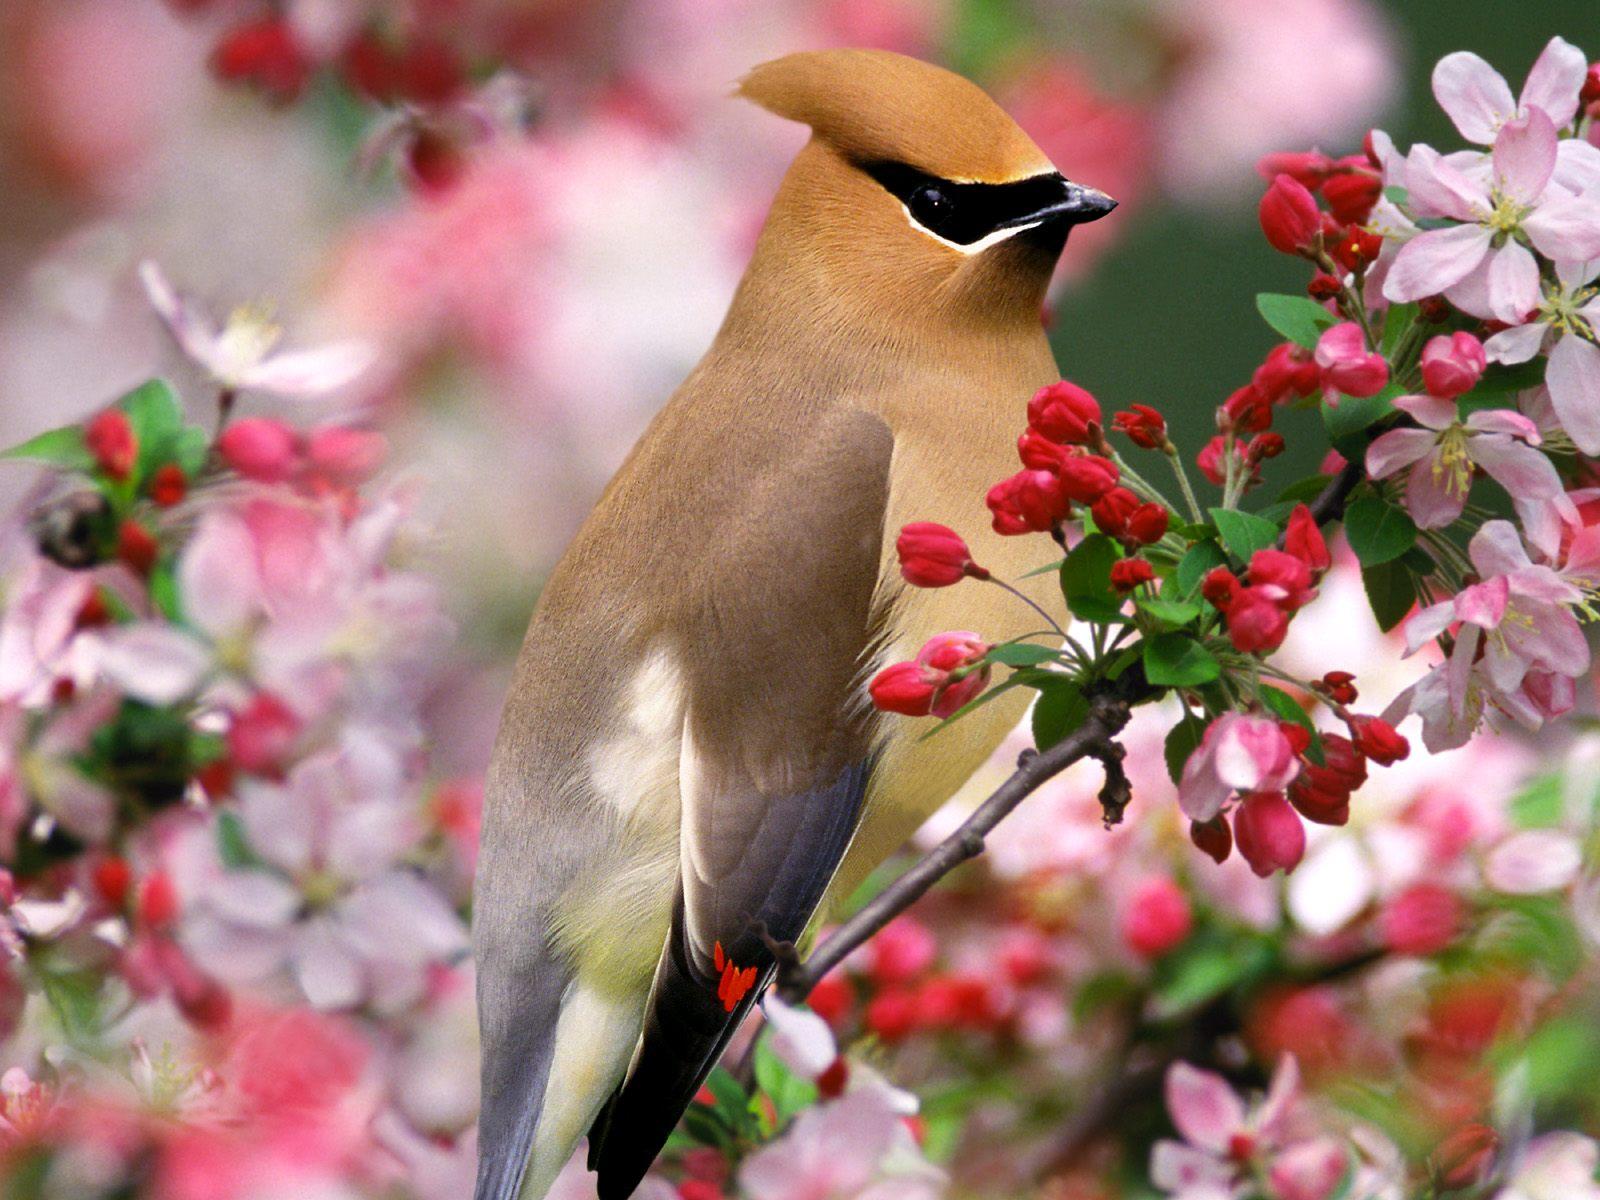 http://4.bp.blogspot.com/_TcwbPuj2SZ0/TFMguguItvI/AAAAAAAARvg/ikd1EIF6tfU/s1600/Bird-Cedar-Waxwing-Desktop-Background.jpg